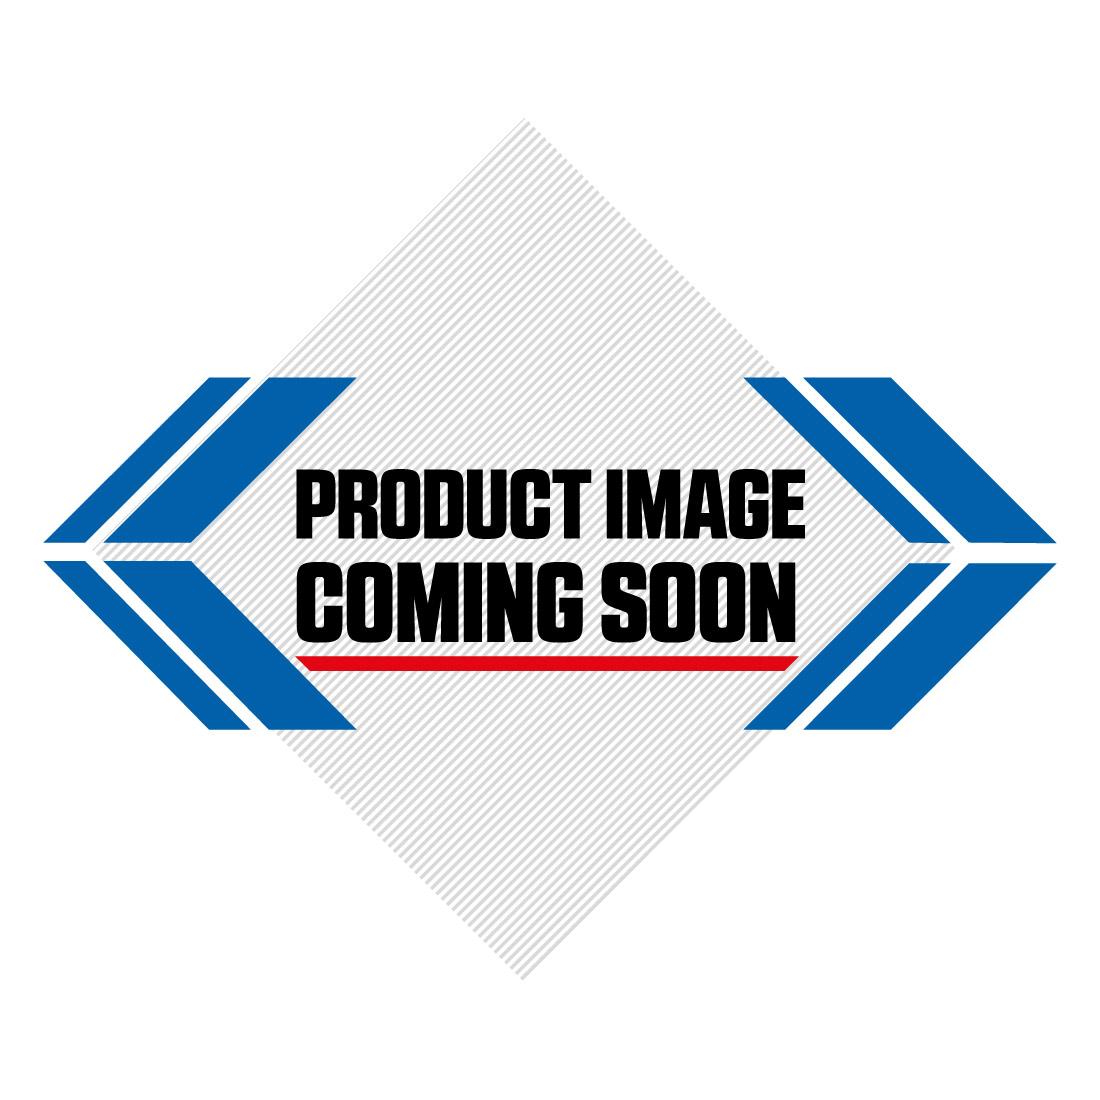 Sidi Orange Fluo White Blue Crossfire 2 SRS MX Boots Image-0